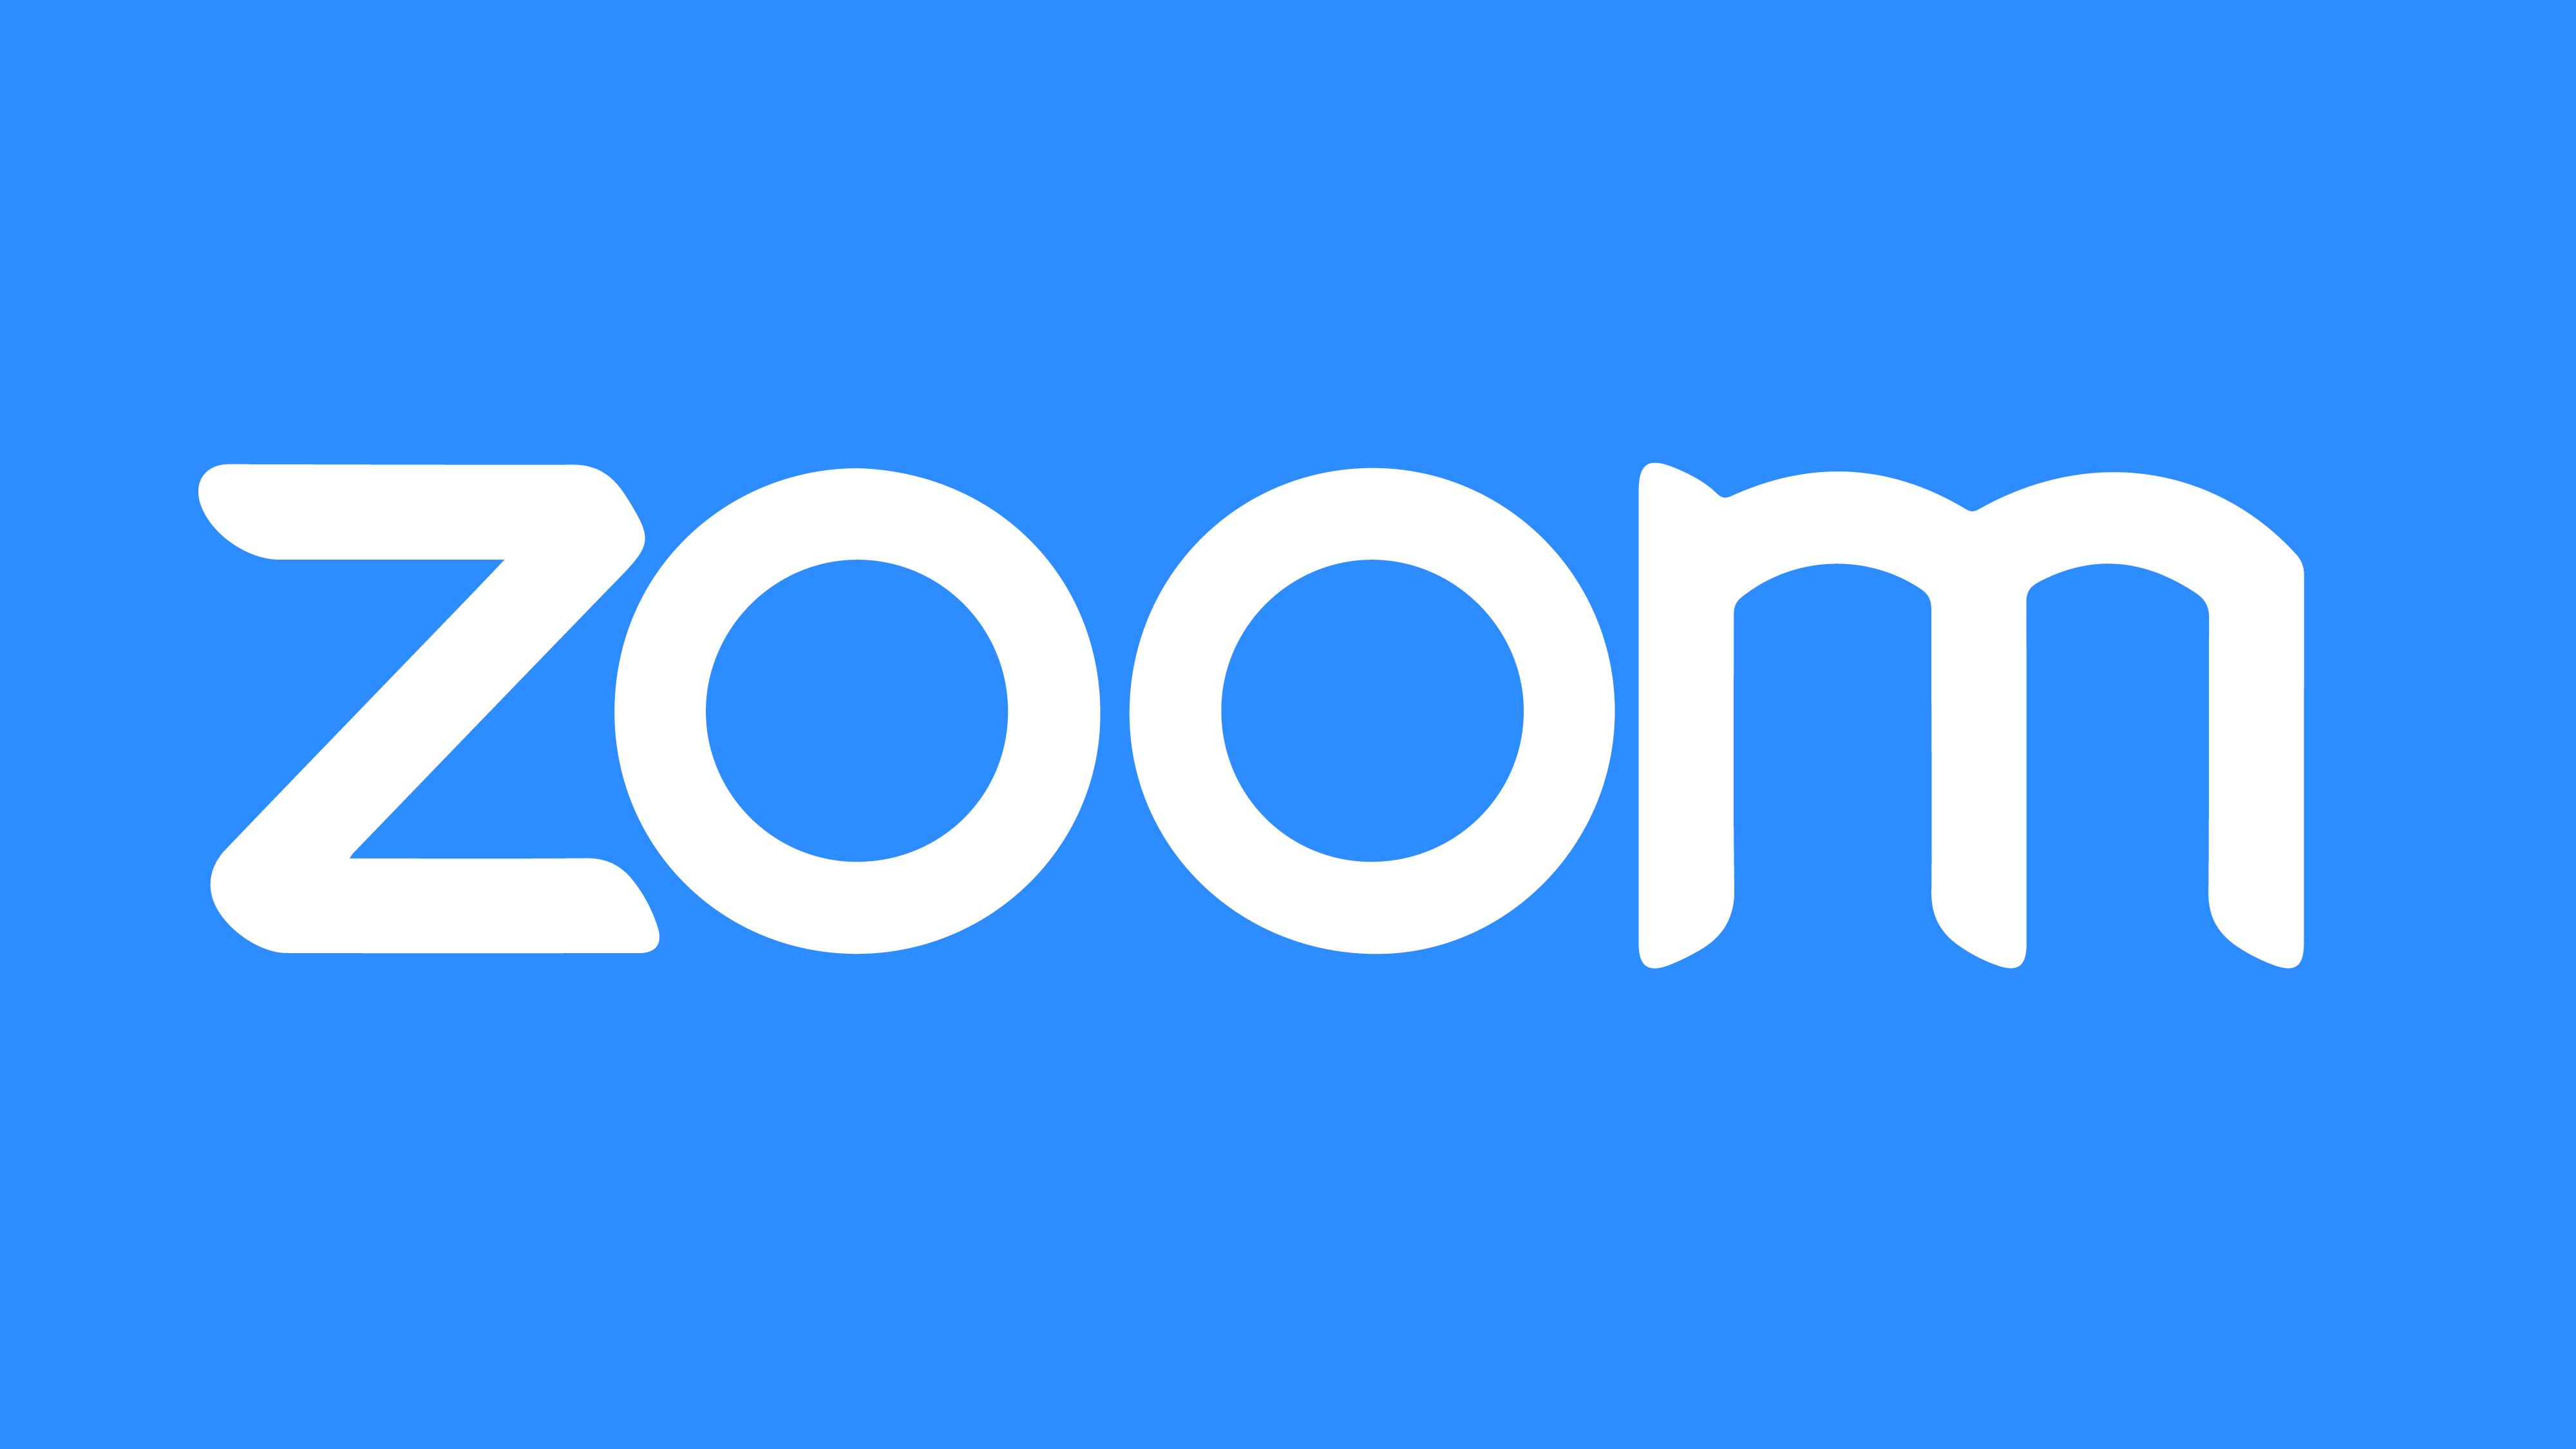 zoom meeting logo   MotionGraphicPlus